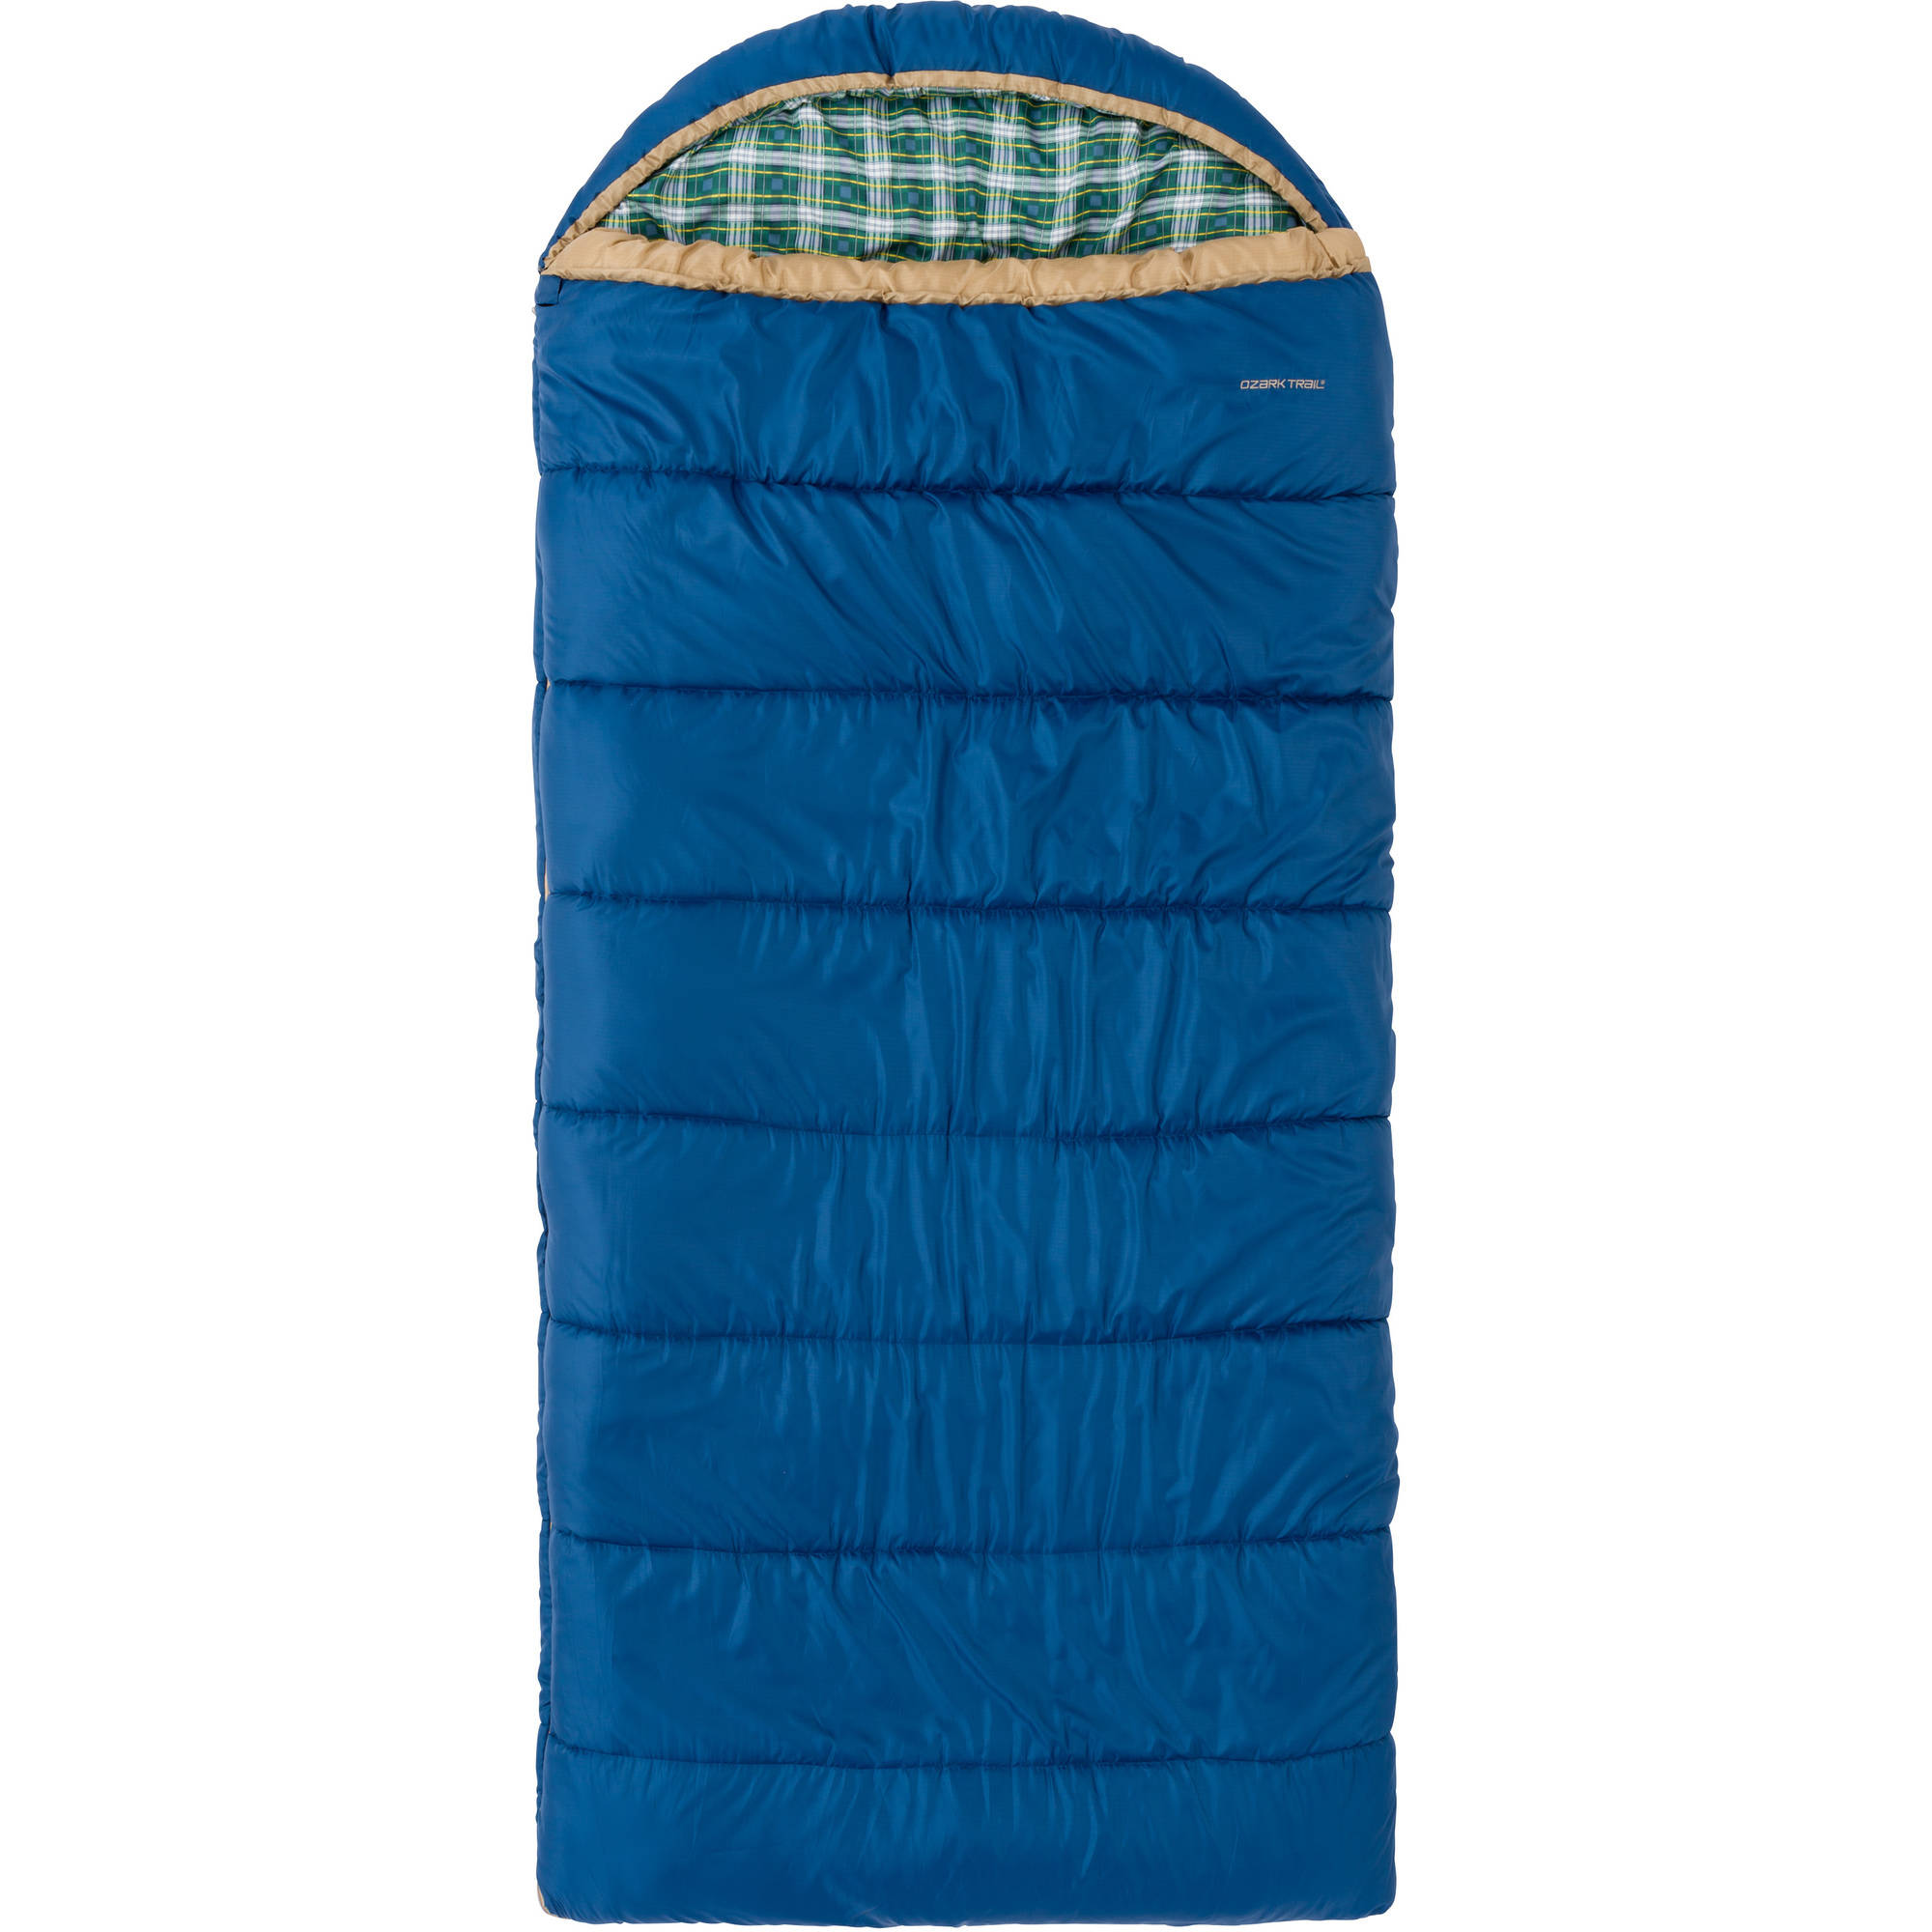 Ozark Trail ENV Zero Extra-Large Sleeping Bag, Blue by Generic